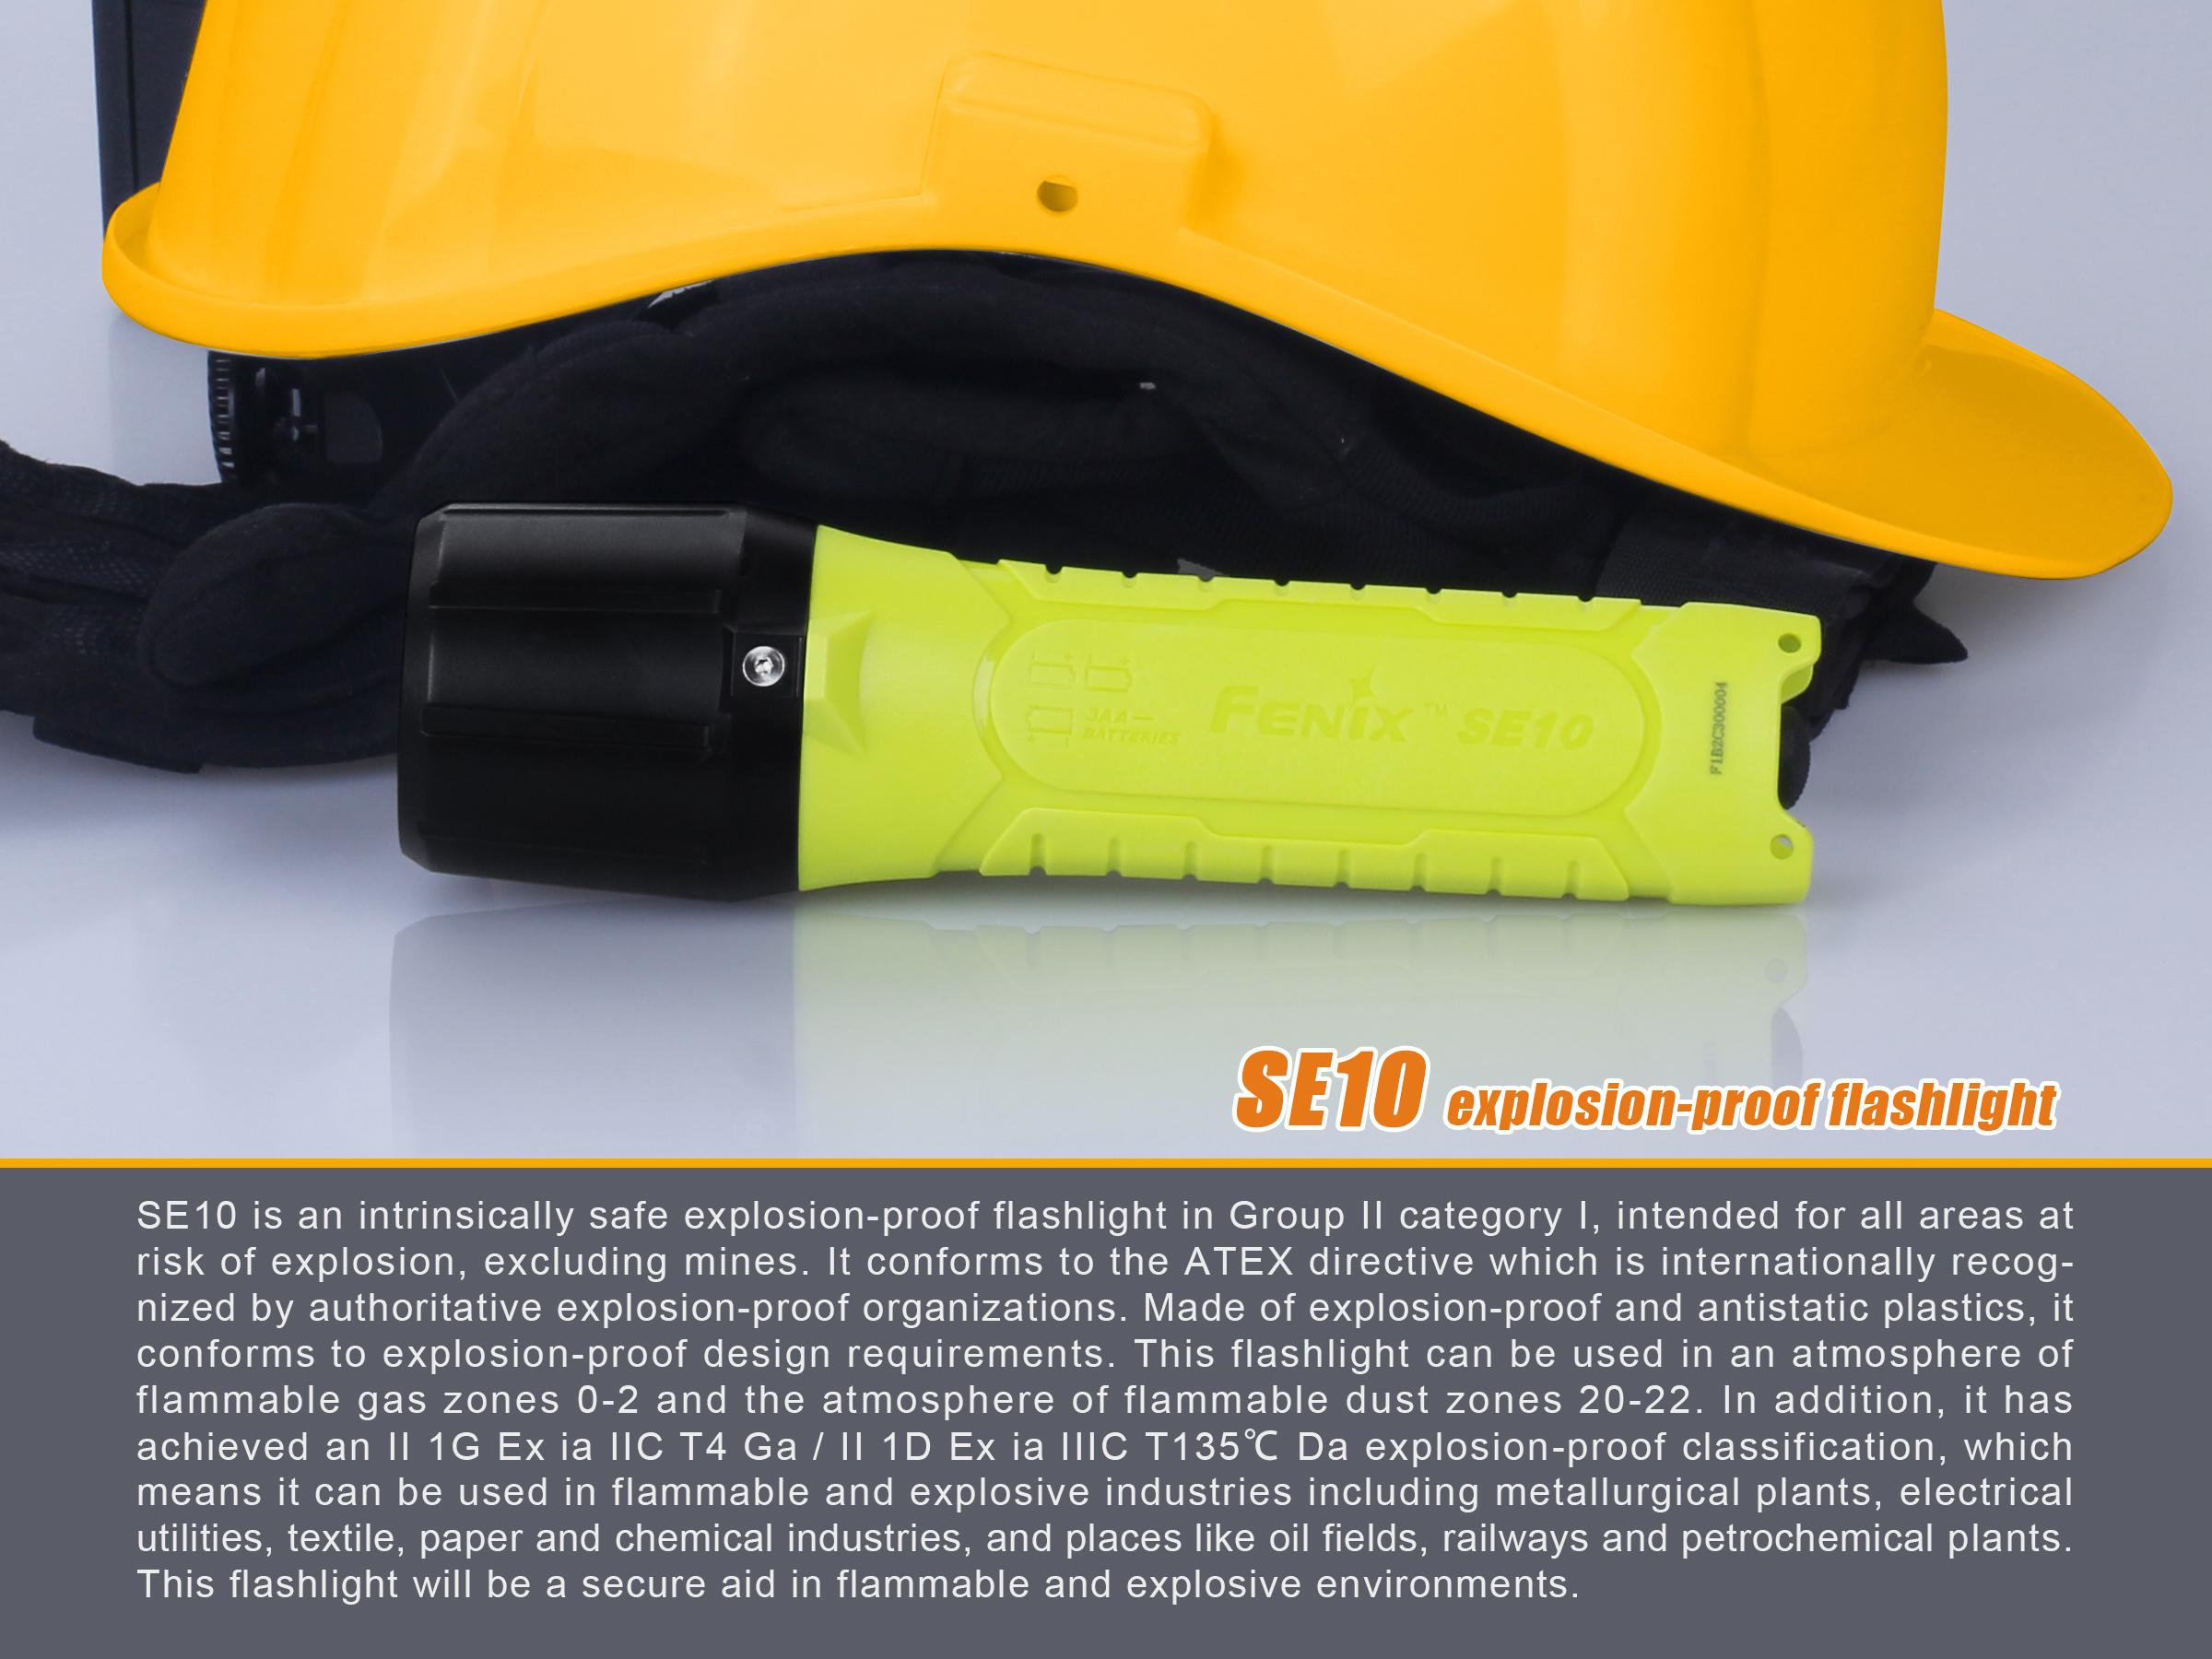 SE10 002